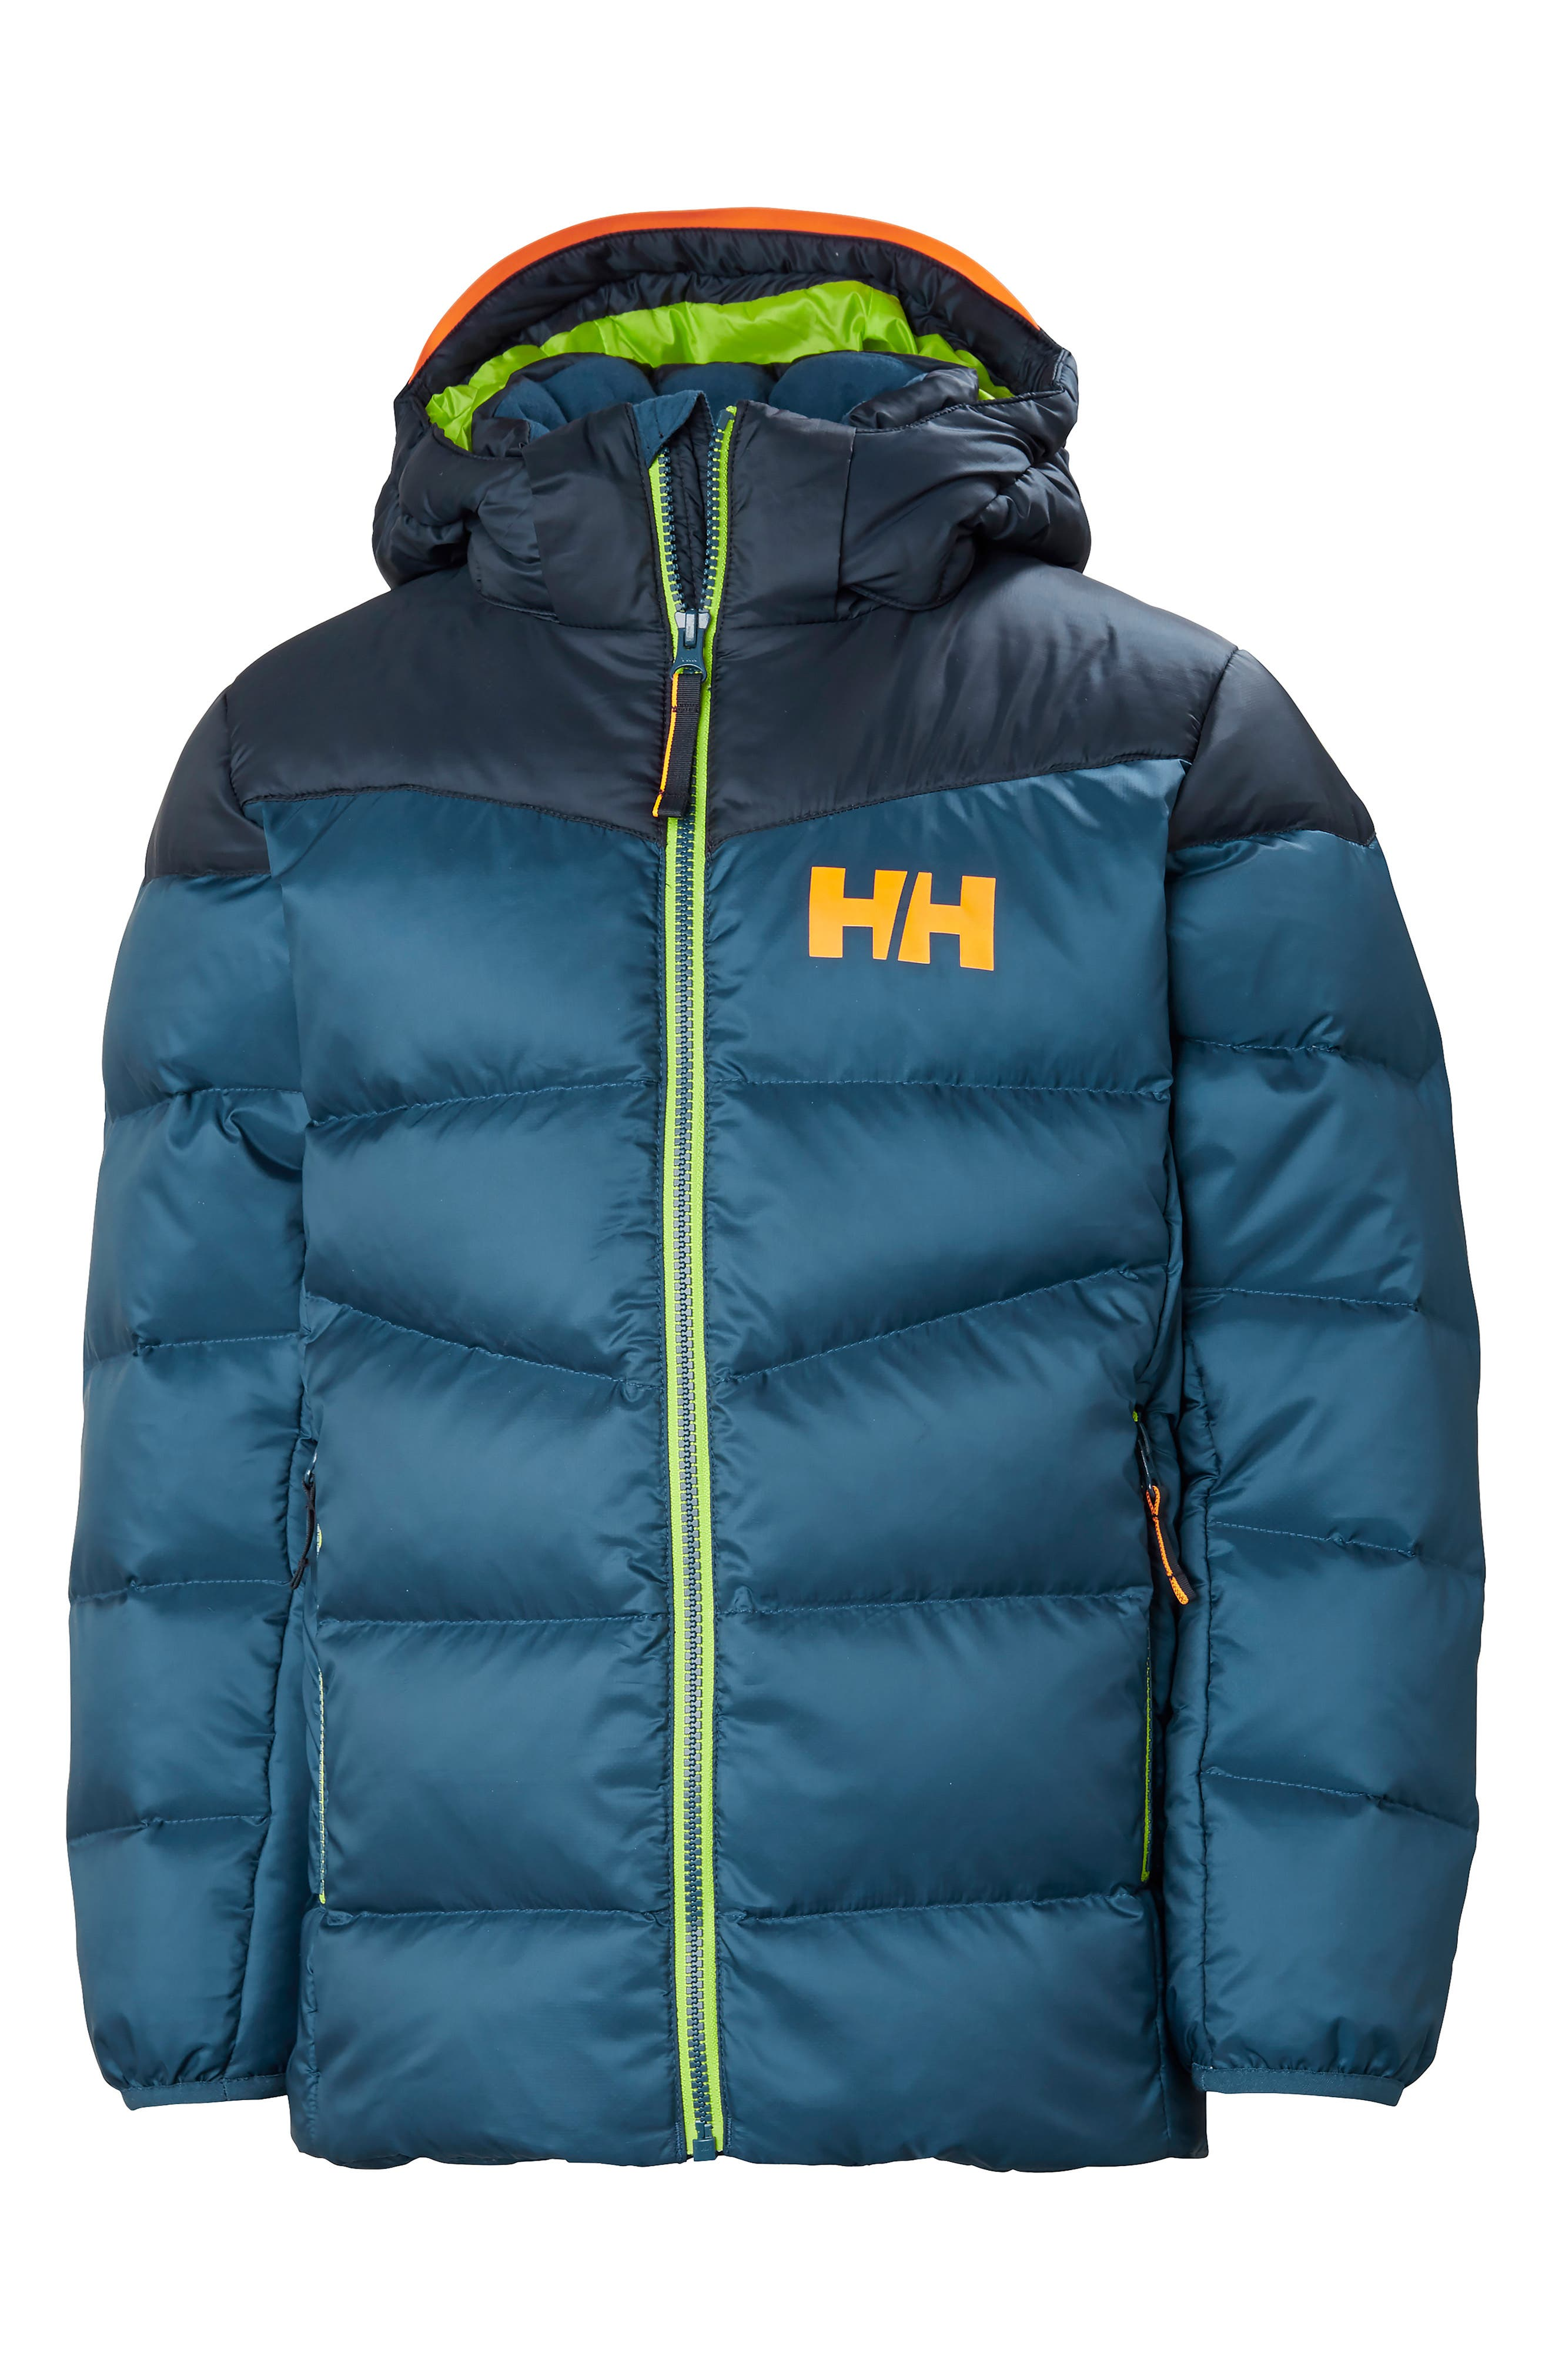 Fjord Water Resistant Puffer Jacket,                         Main,                         color, DARK TEAL